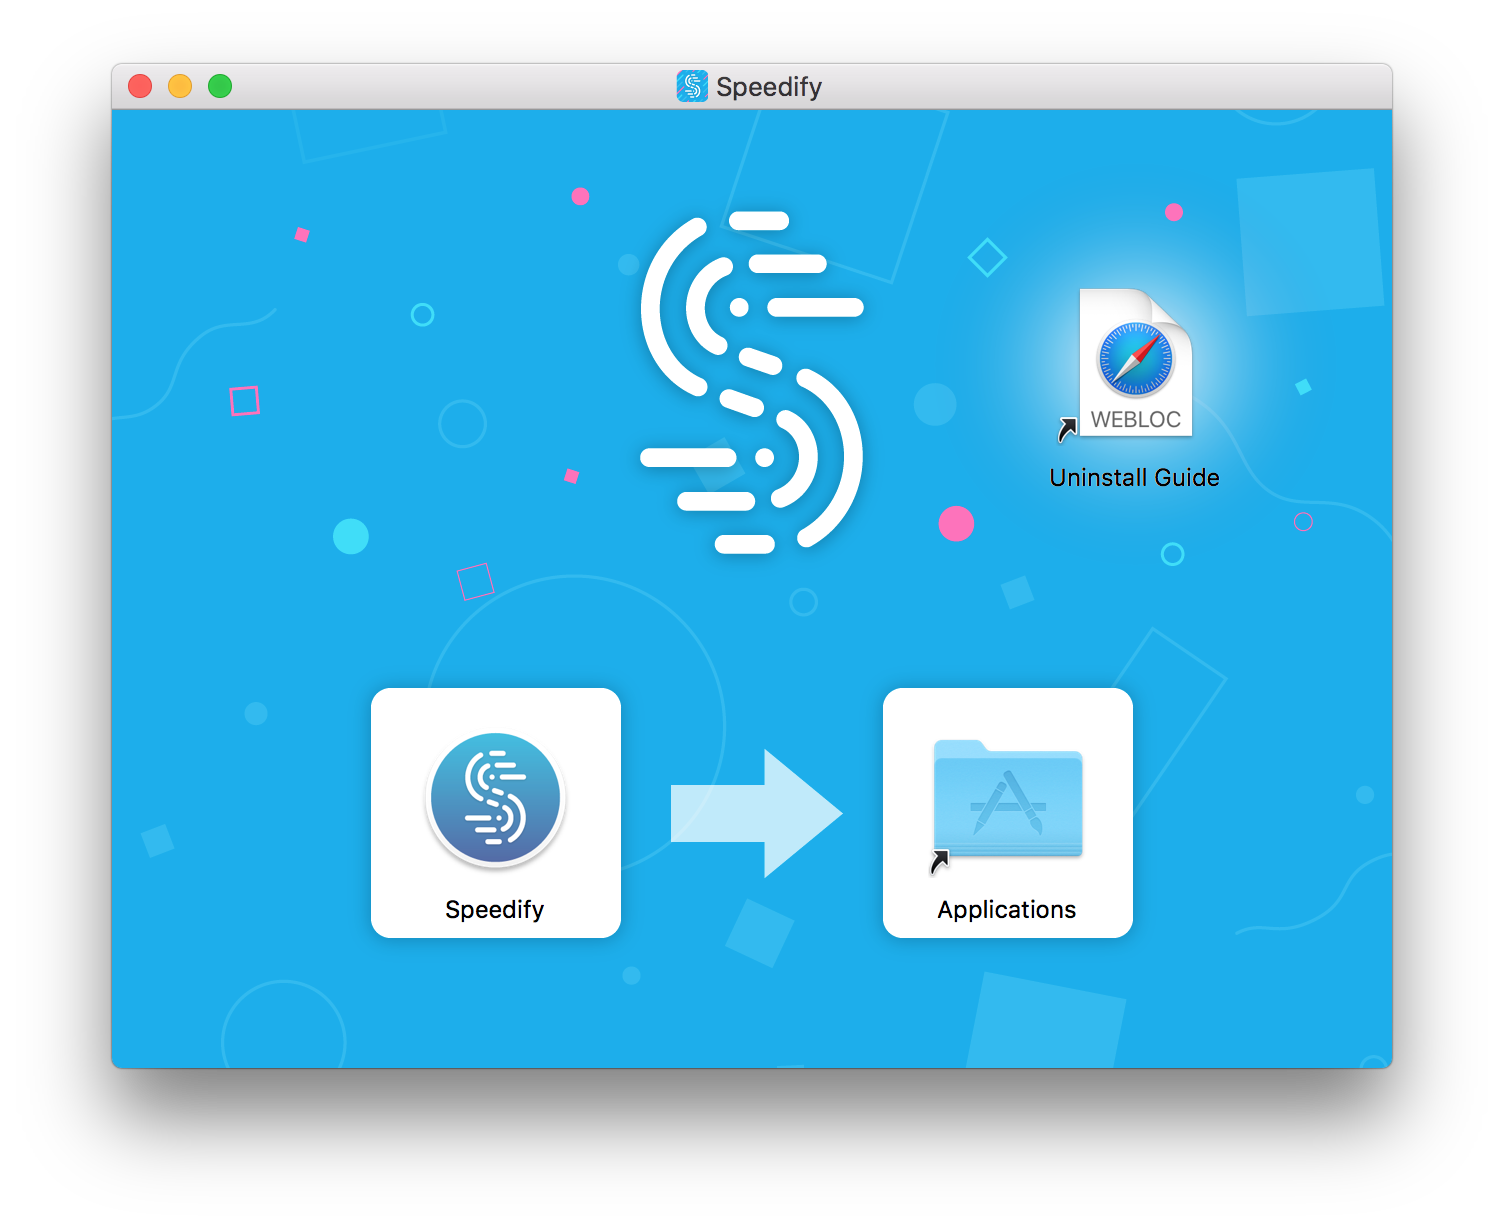 How do I install/uninstall Speedify on macOS - Speedify